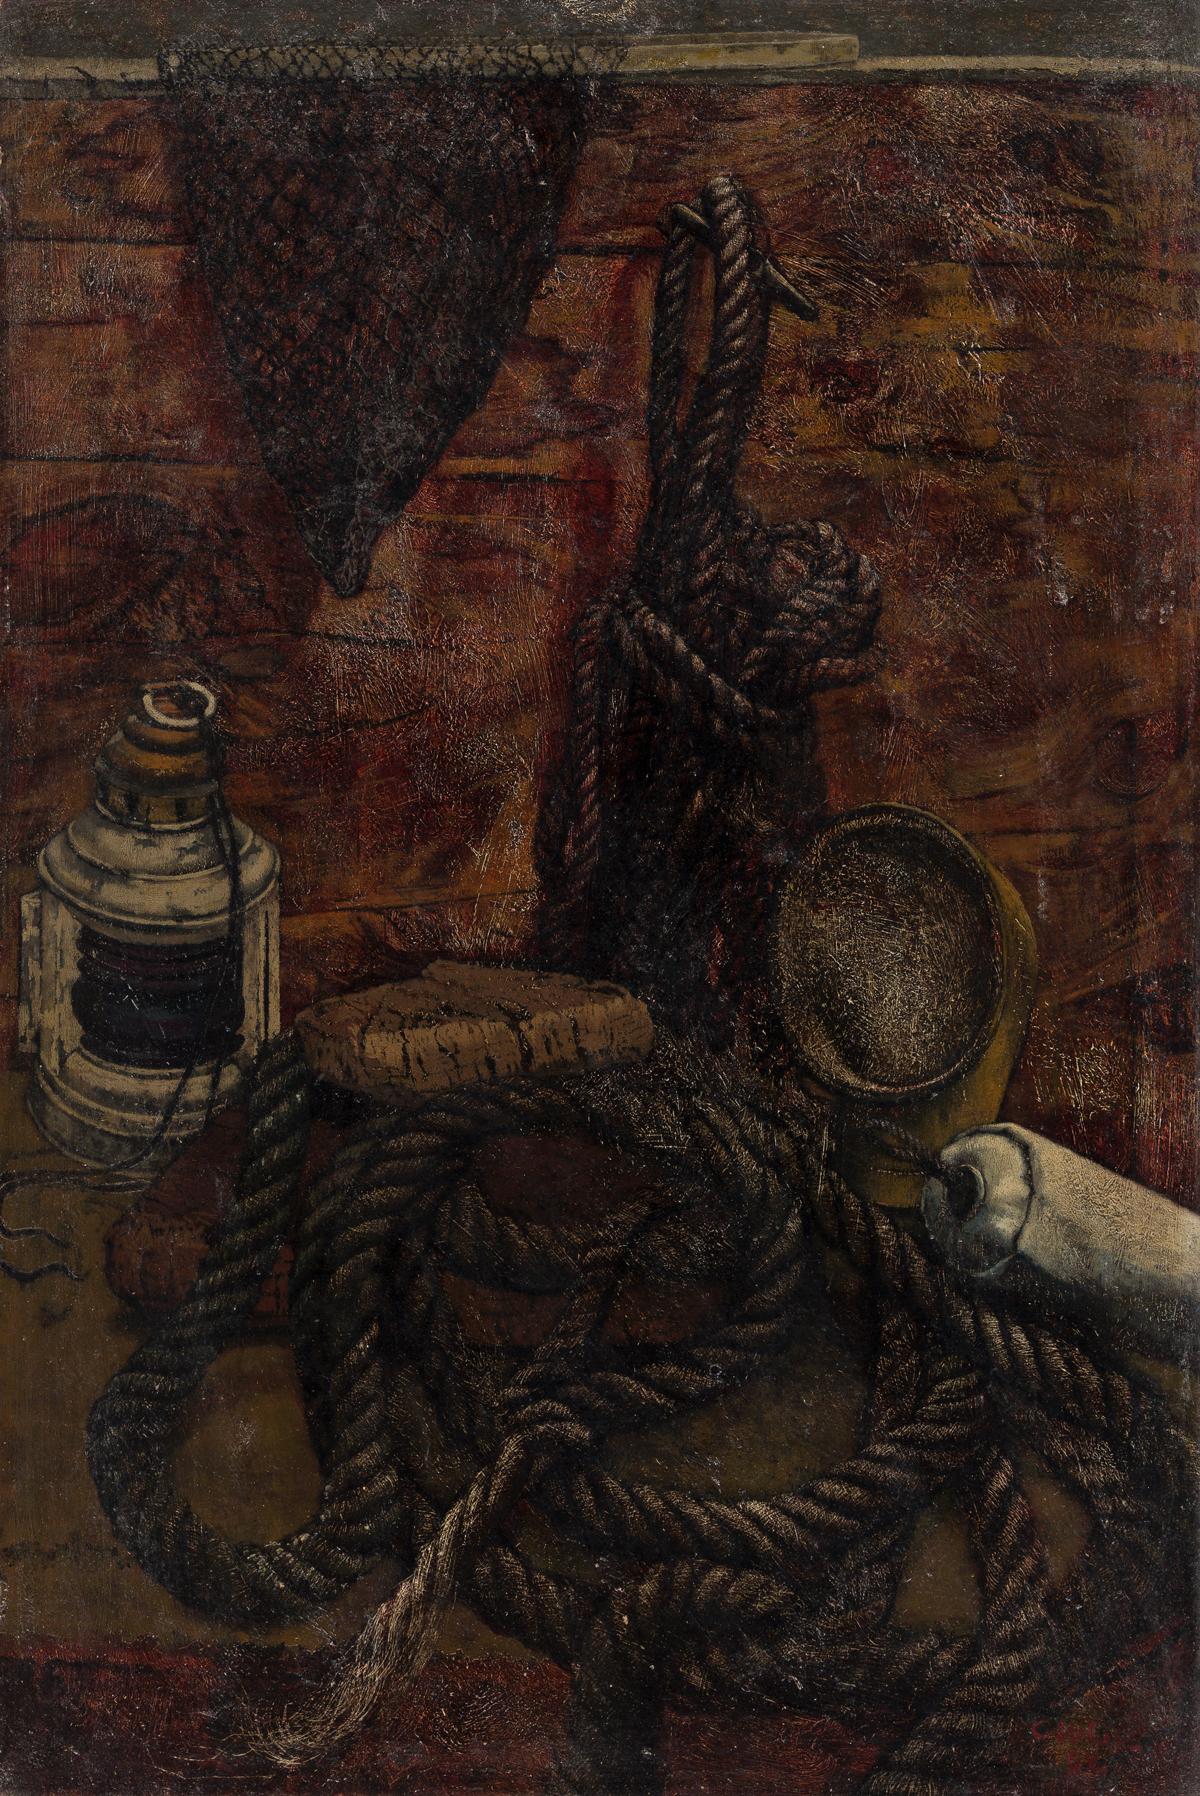 CHARLES MCGEE (1924 - 2021) Untitled (Still Life).